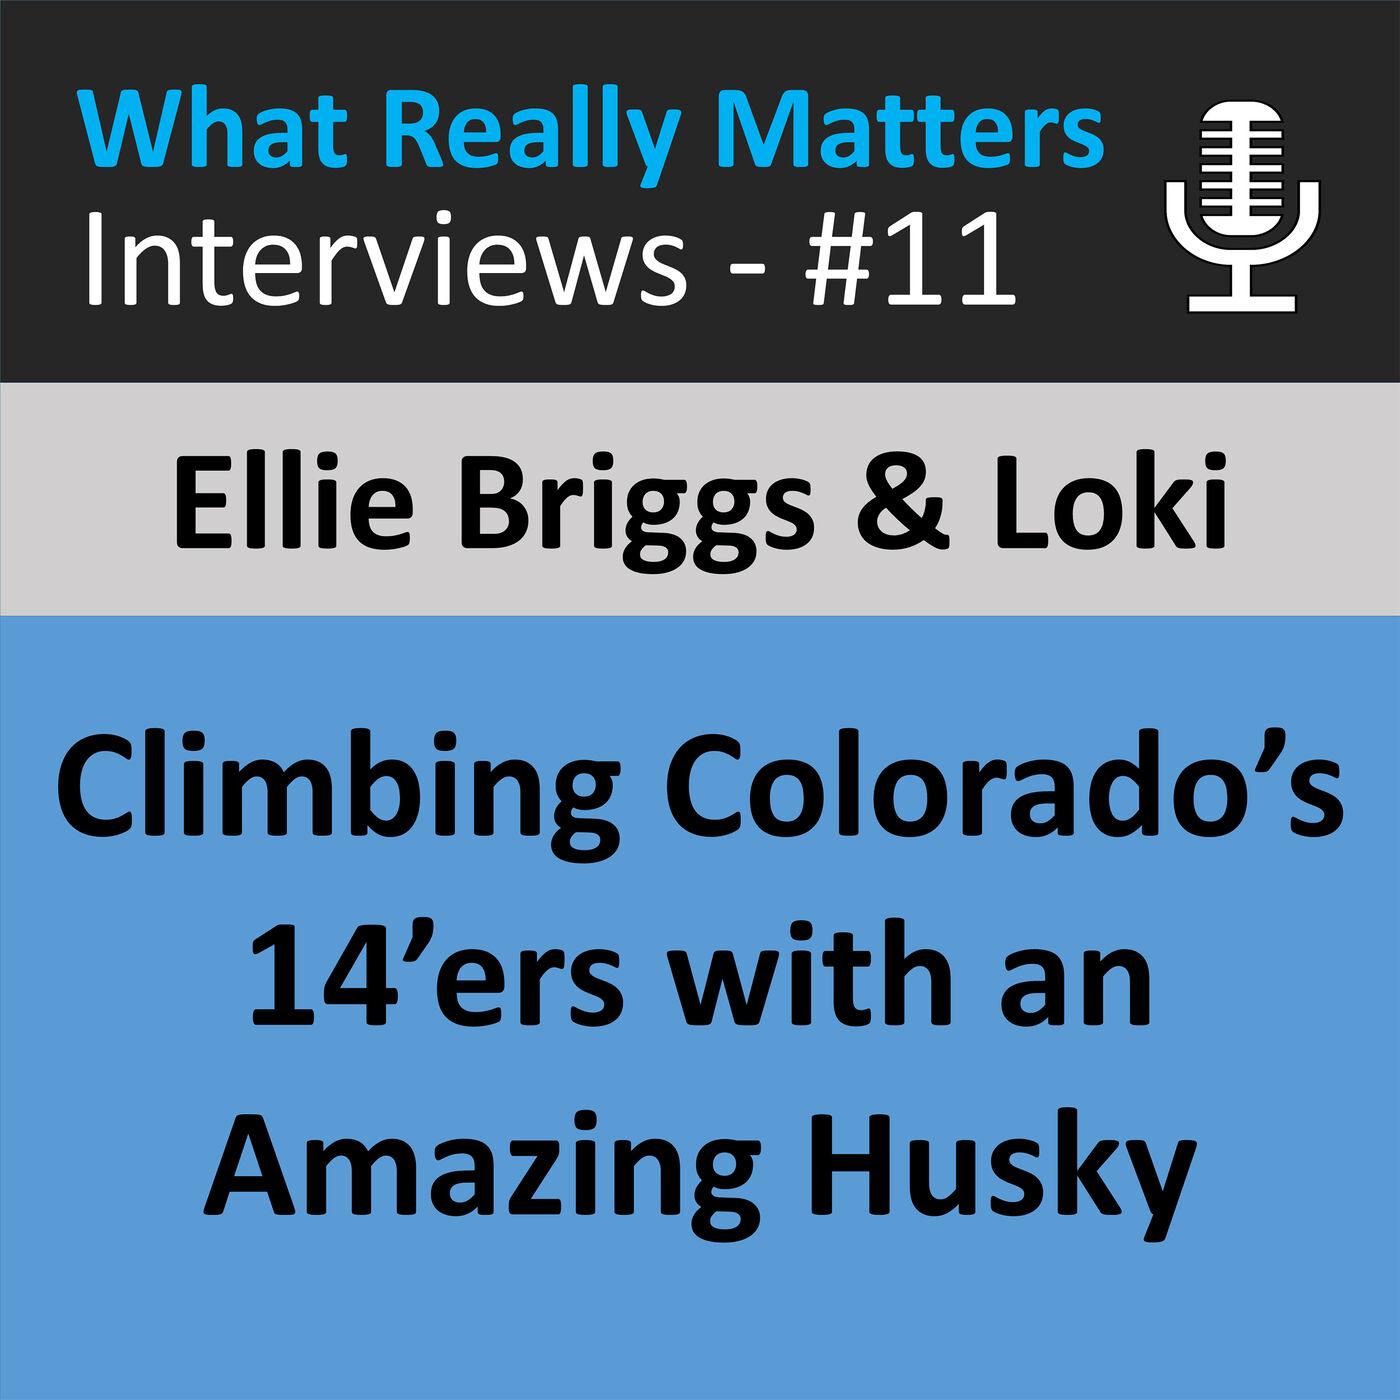 WRMI 011: Ellie Briggs & Loki // A Woman and Her Peak-Climbing Husky